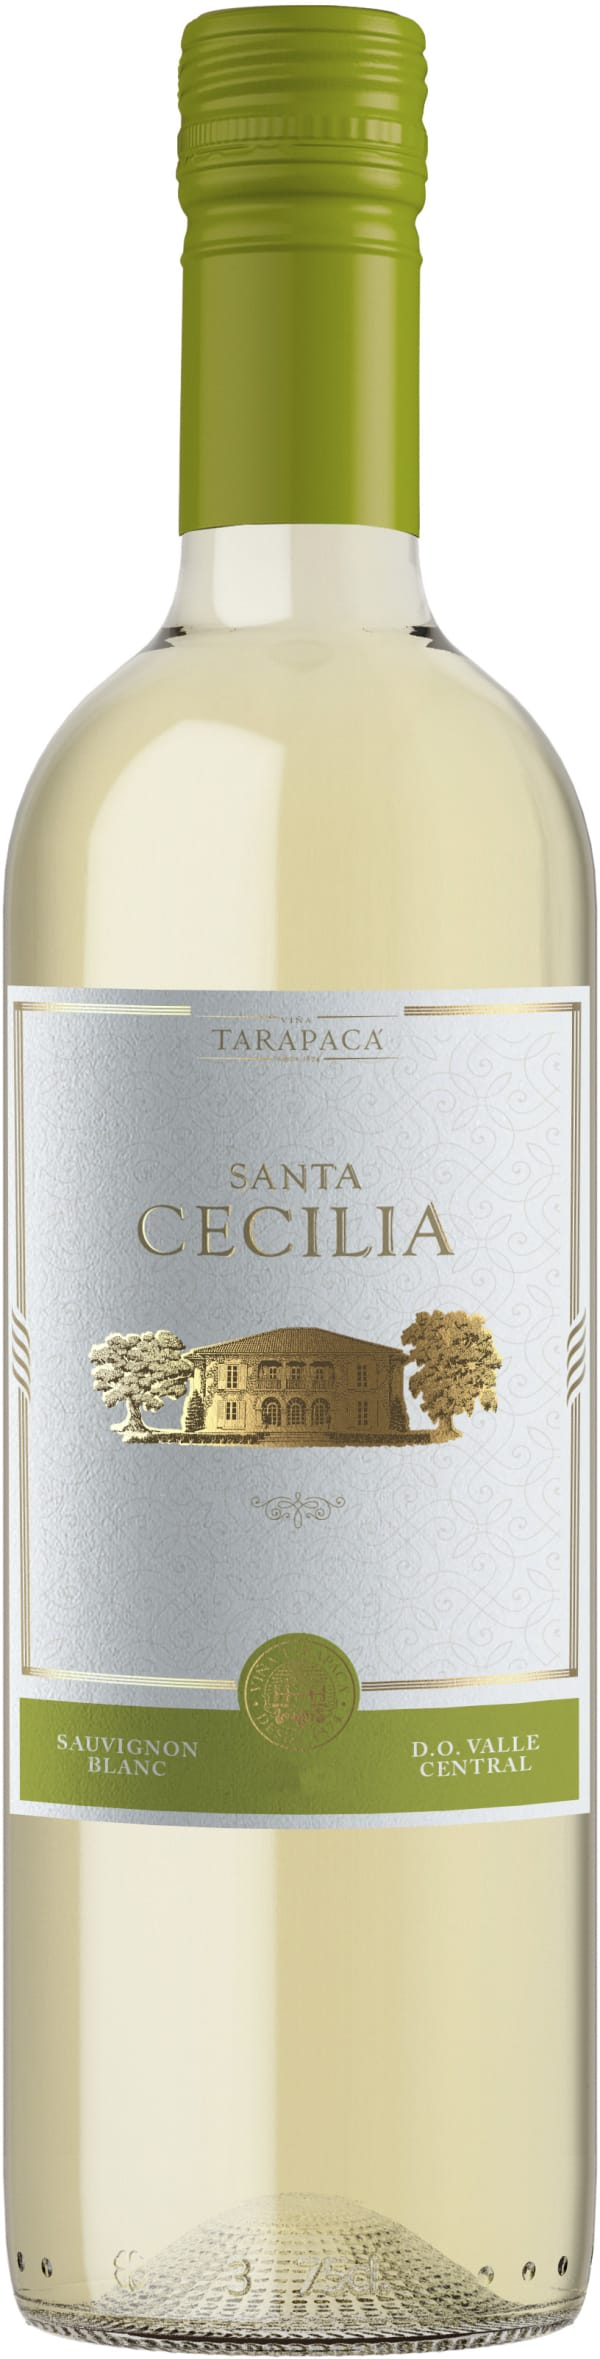 Tarapacá Santa Cecilia Sauvignon Blanc 2020